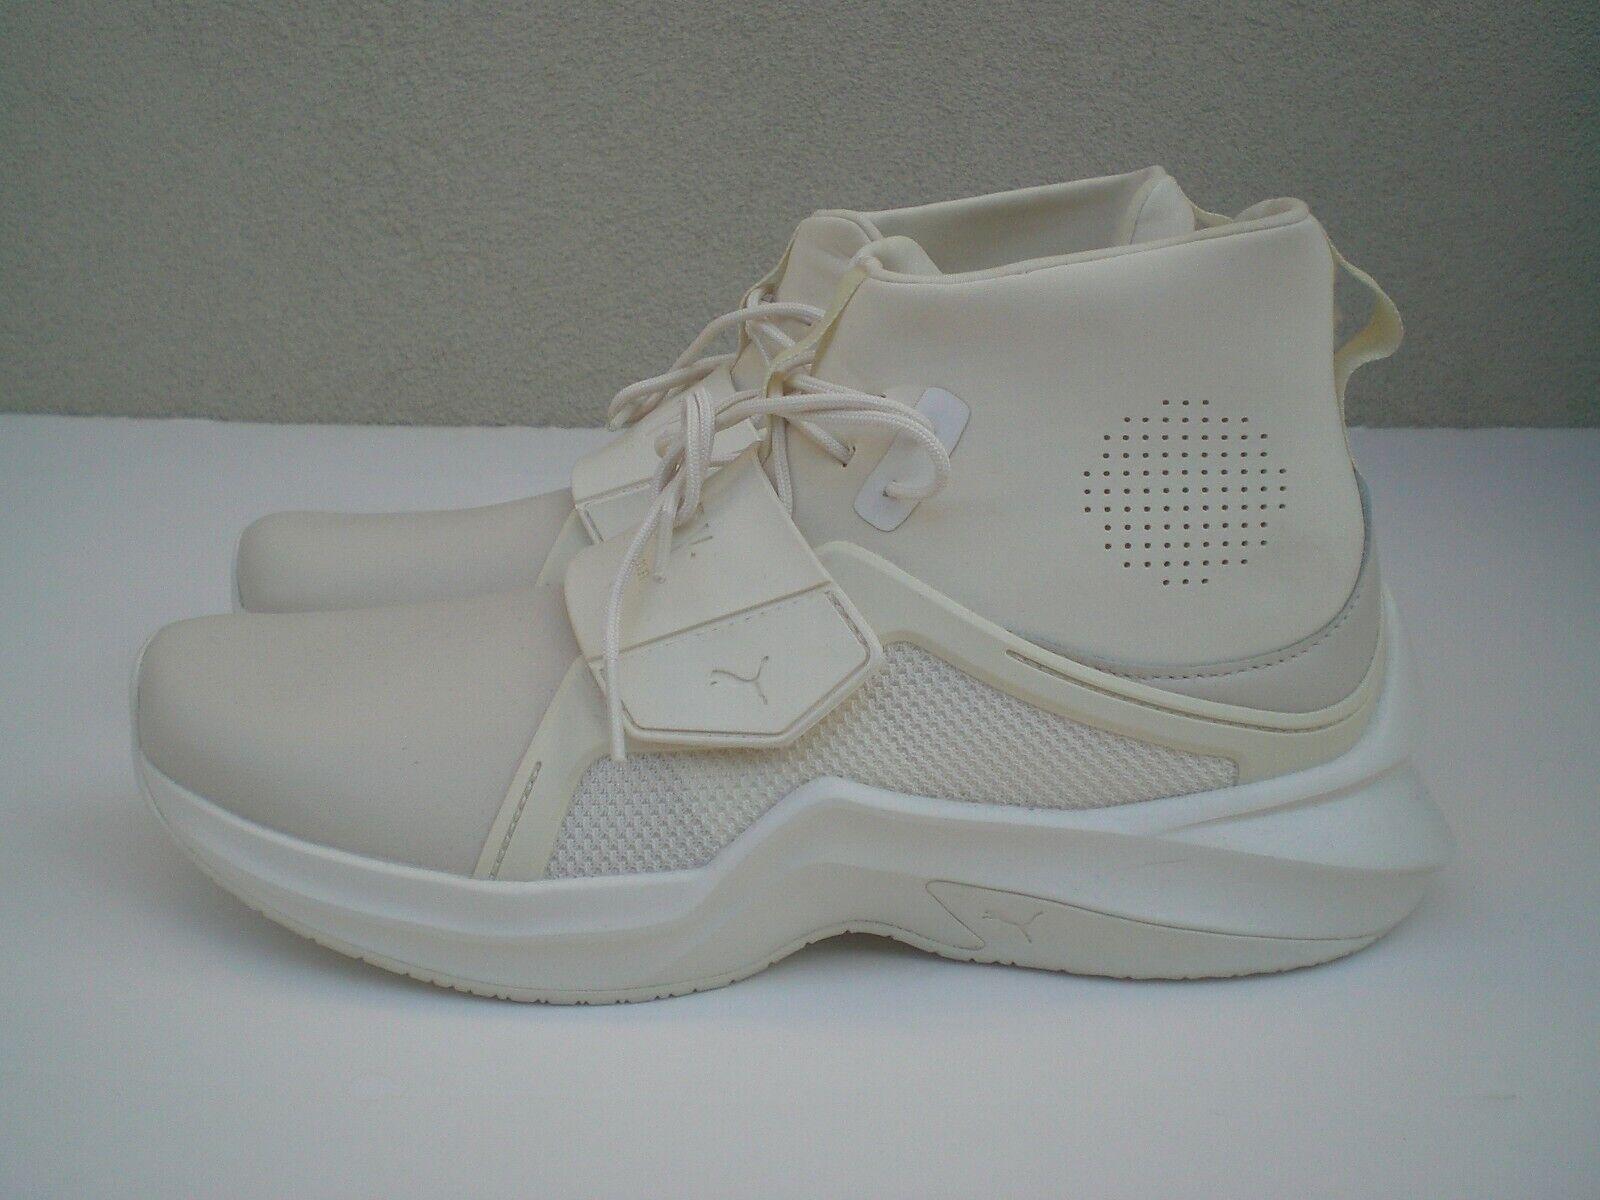 Puma Rihanna Fenty Trainer HI Women's shoes - SZ 8.5